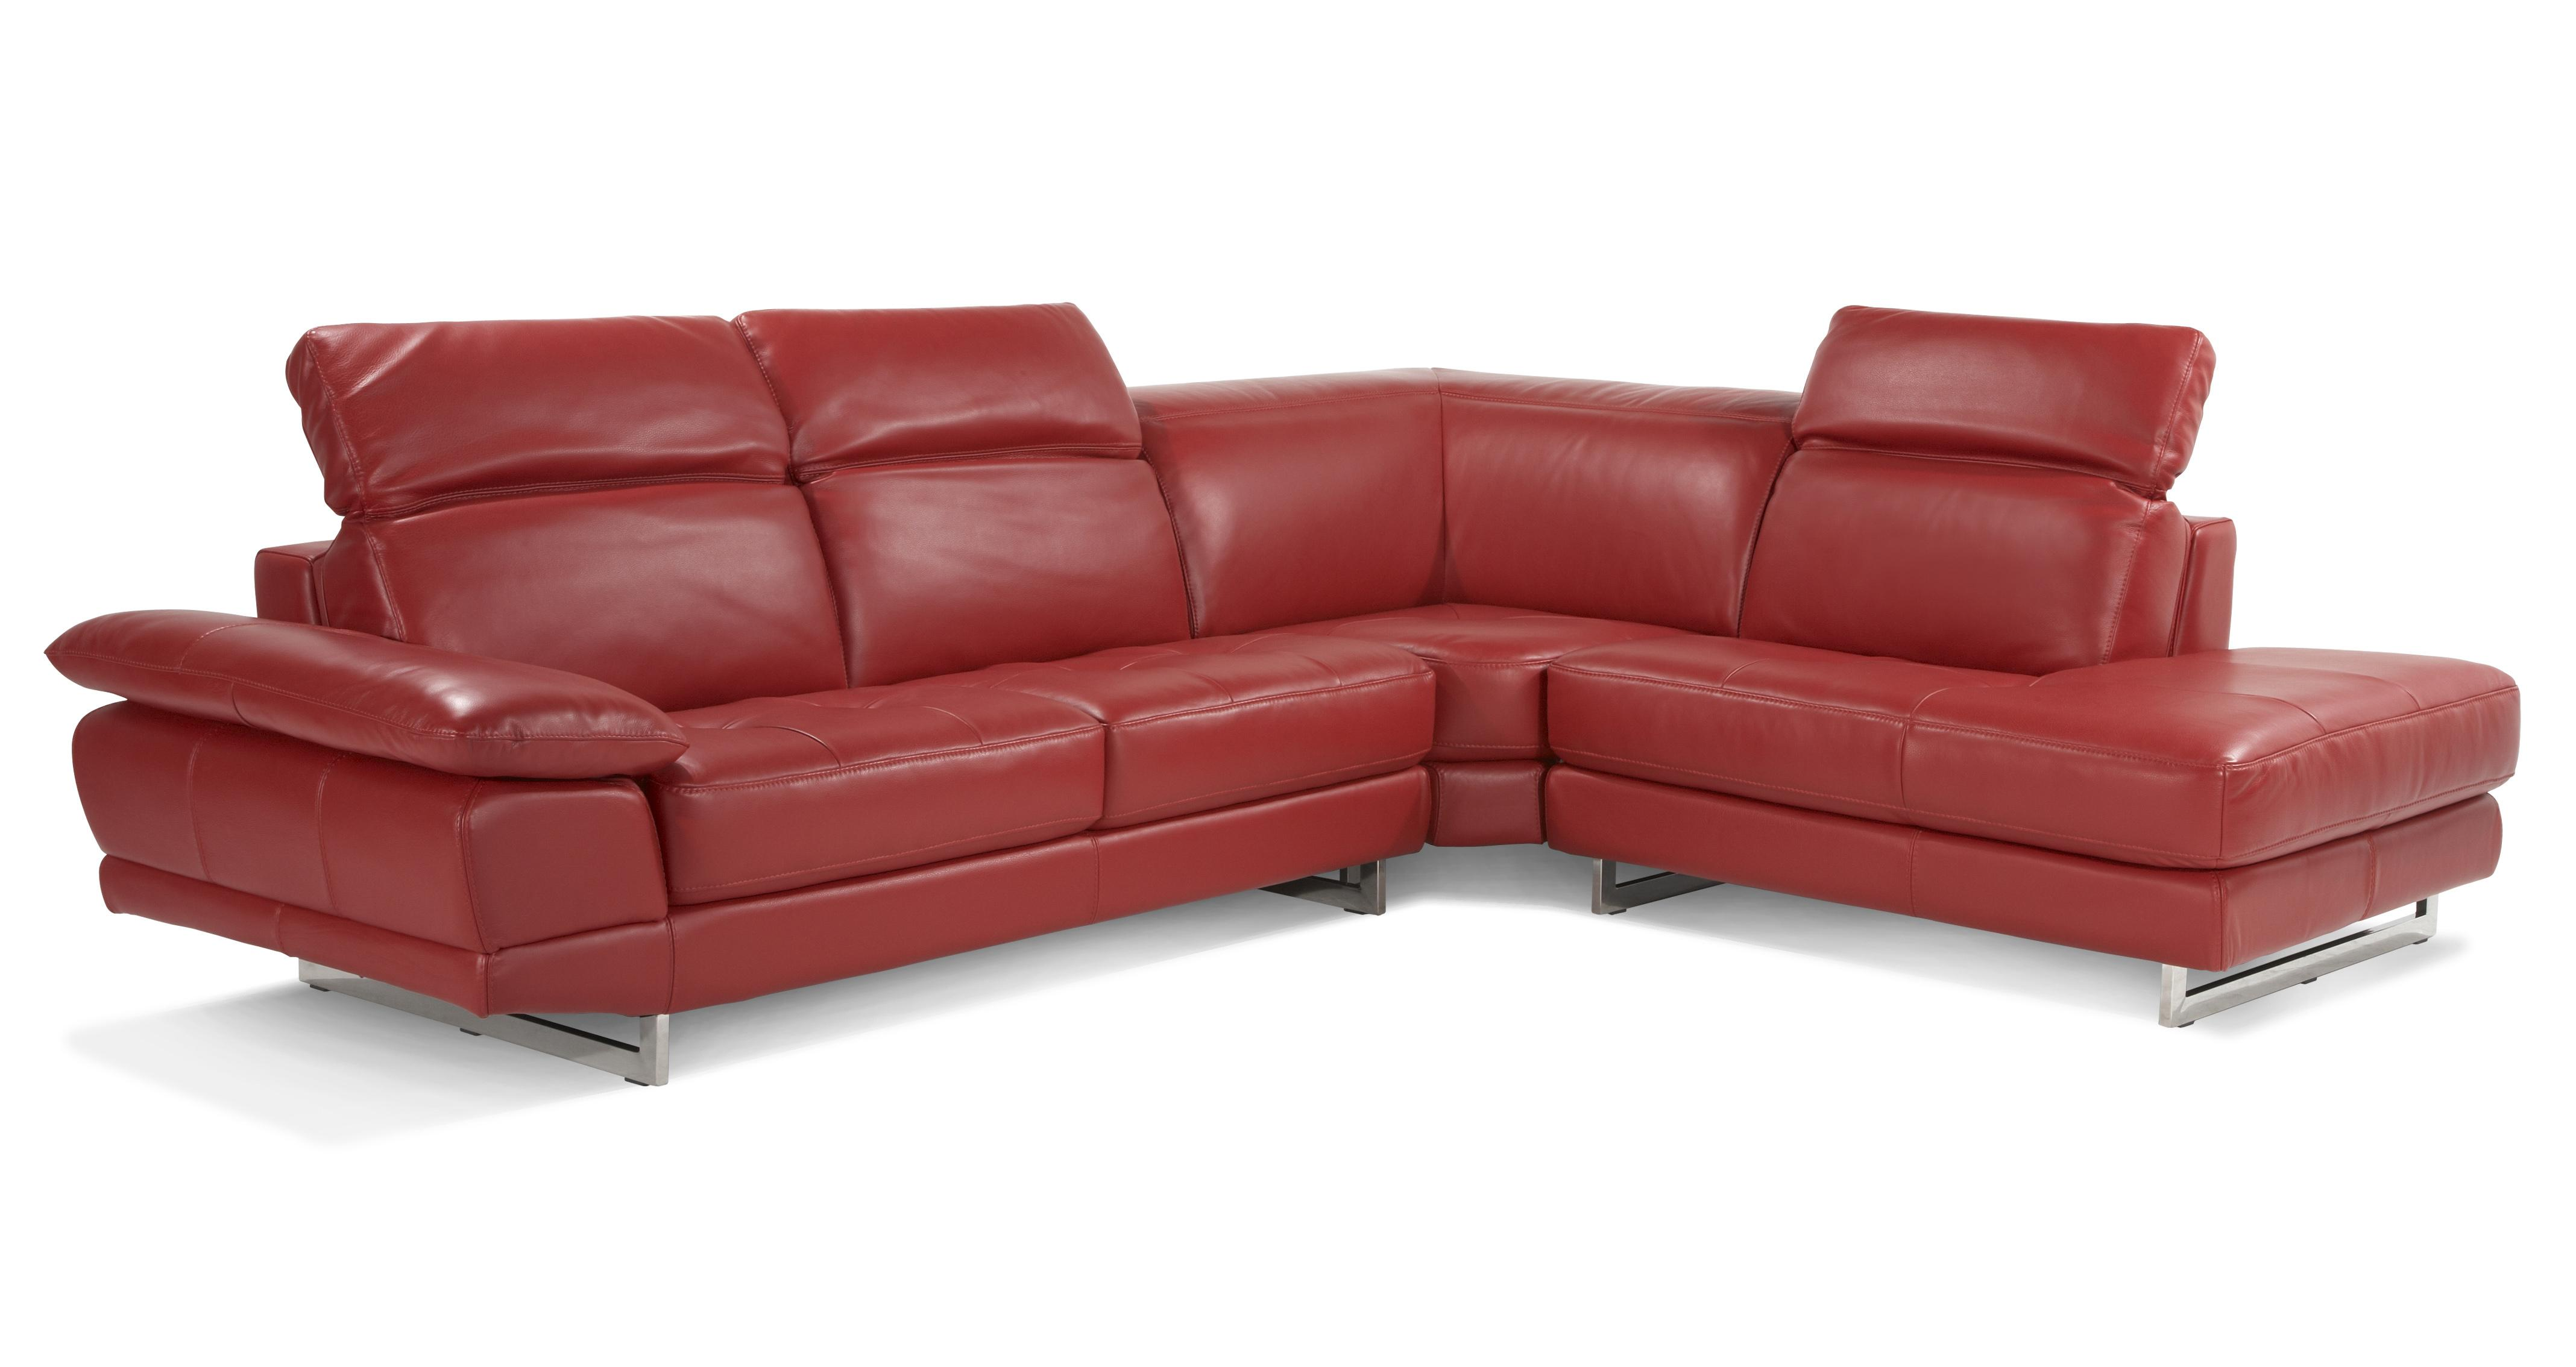 Milan Left Arm Facing Corner Sofa Vogue Leather | DFS